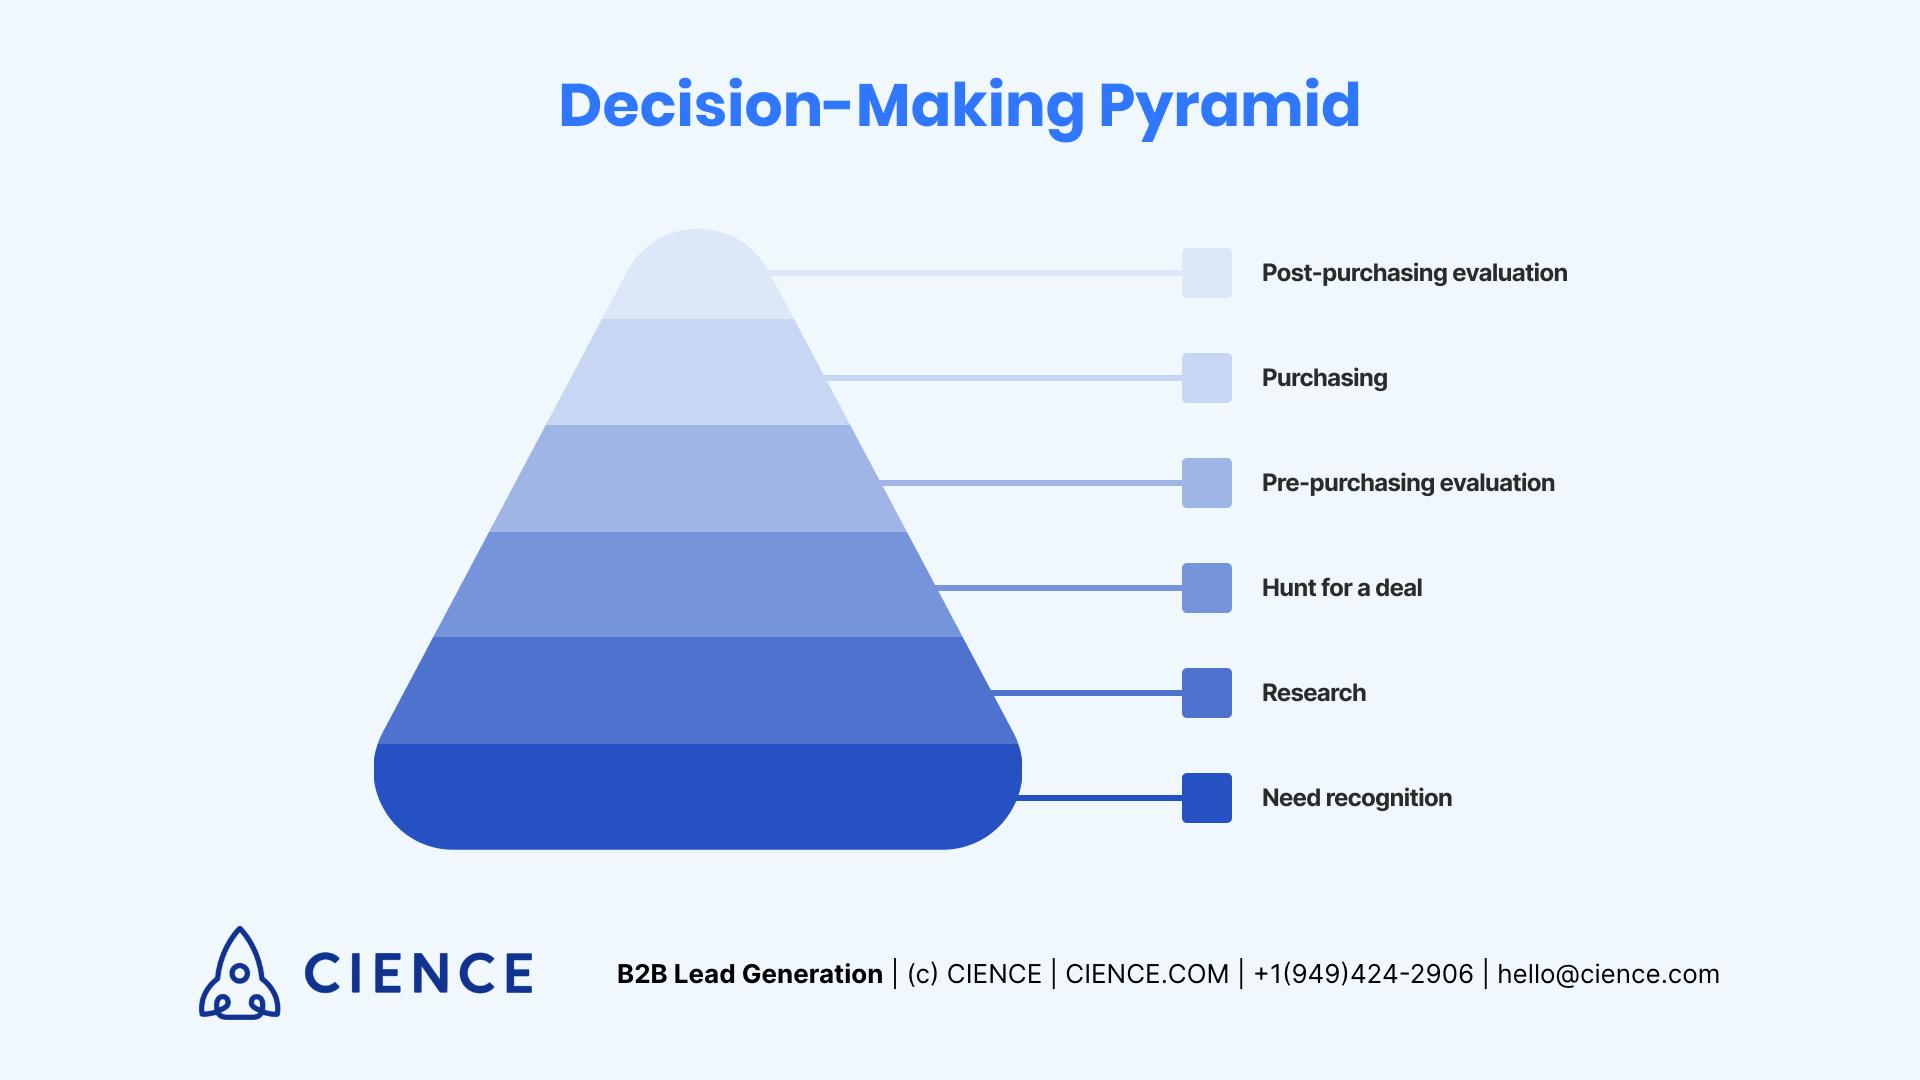 Decision-making pyramid